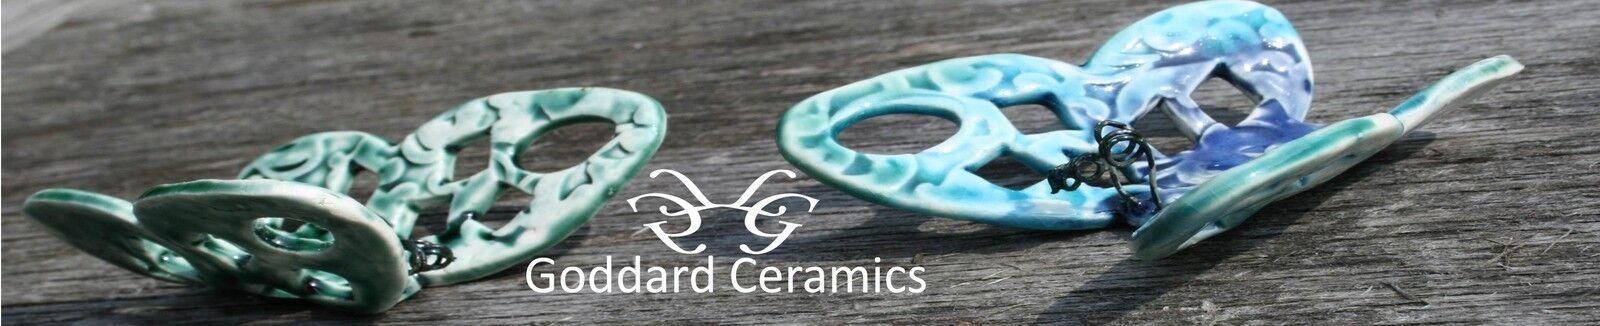 Goddard Ceramics